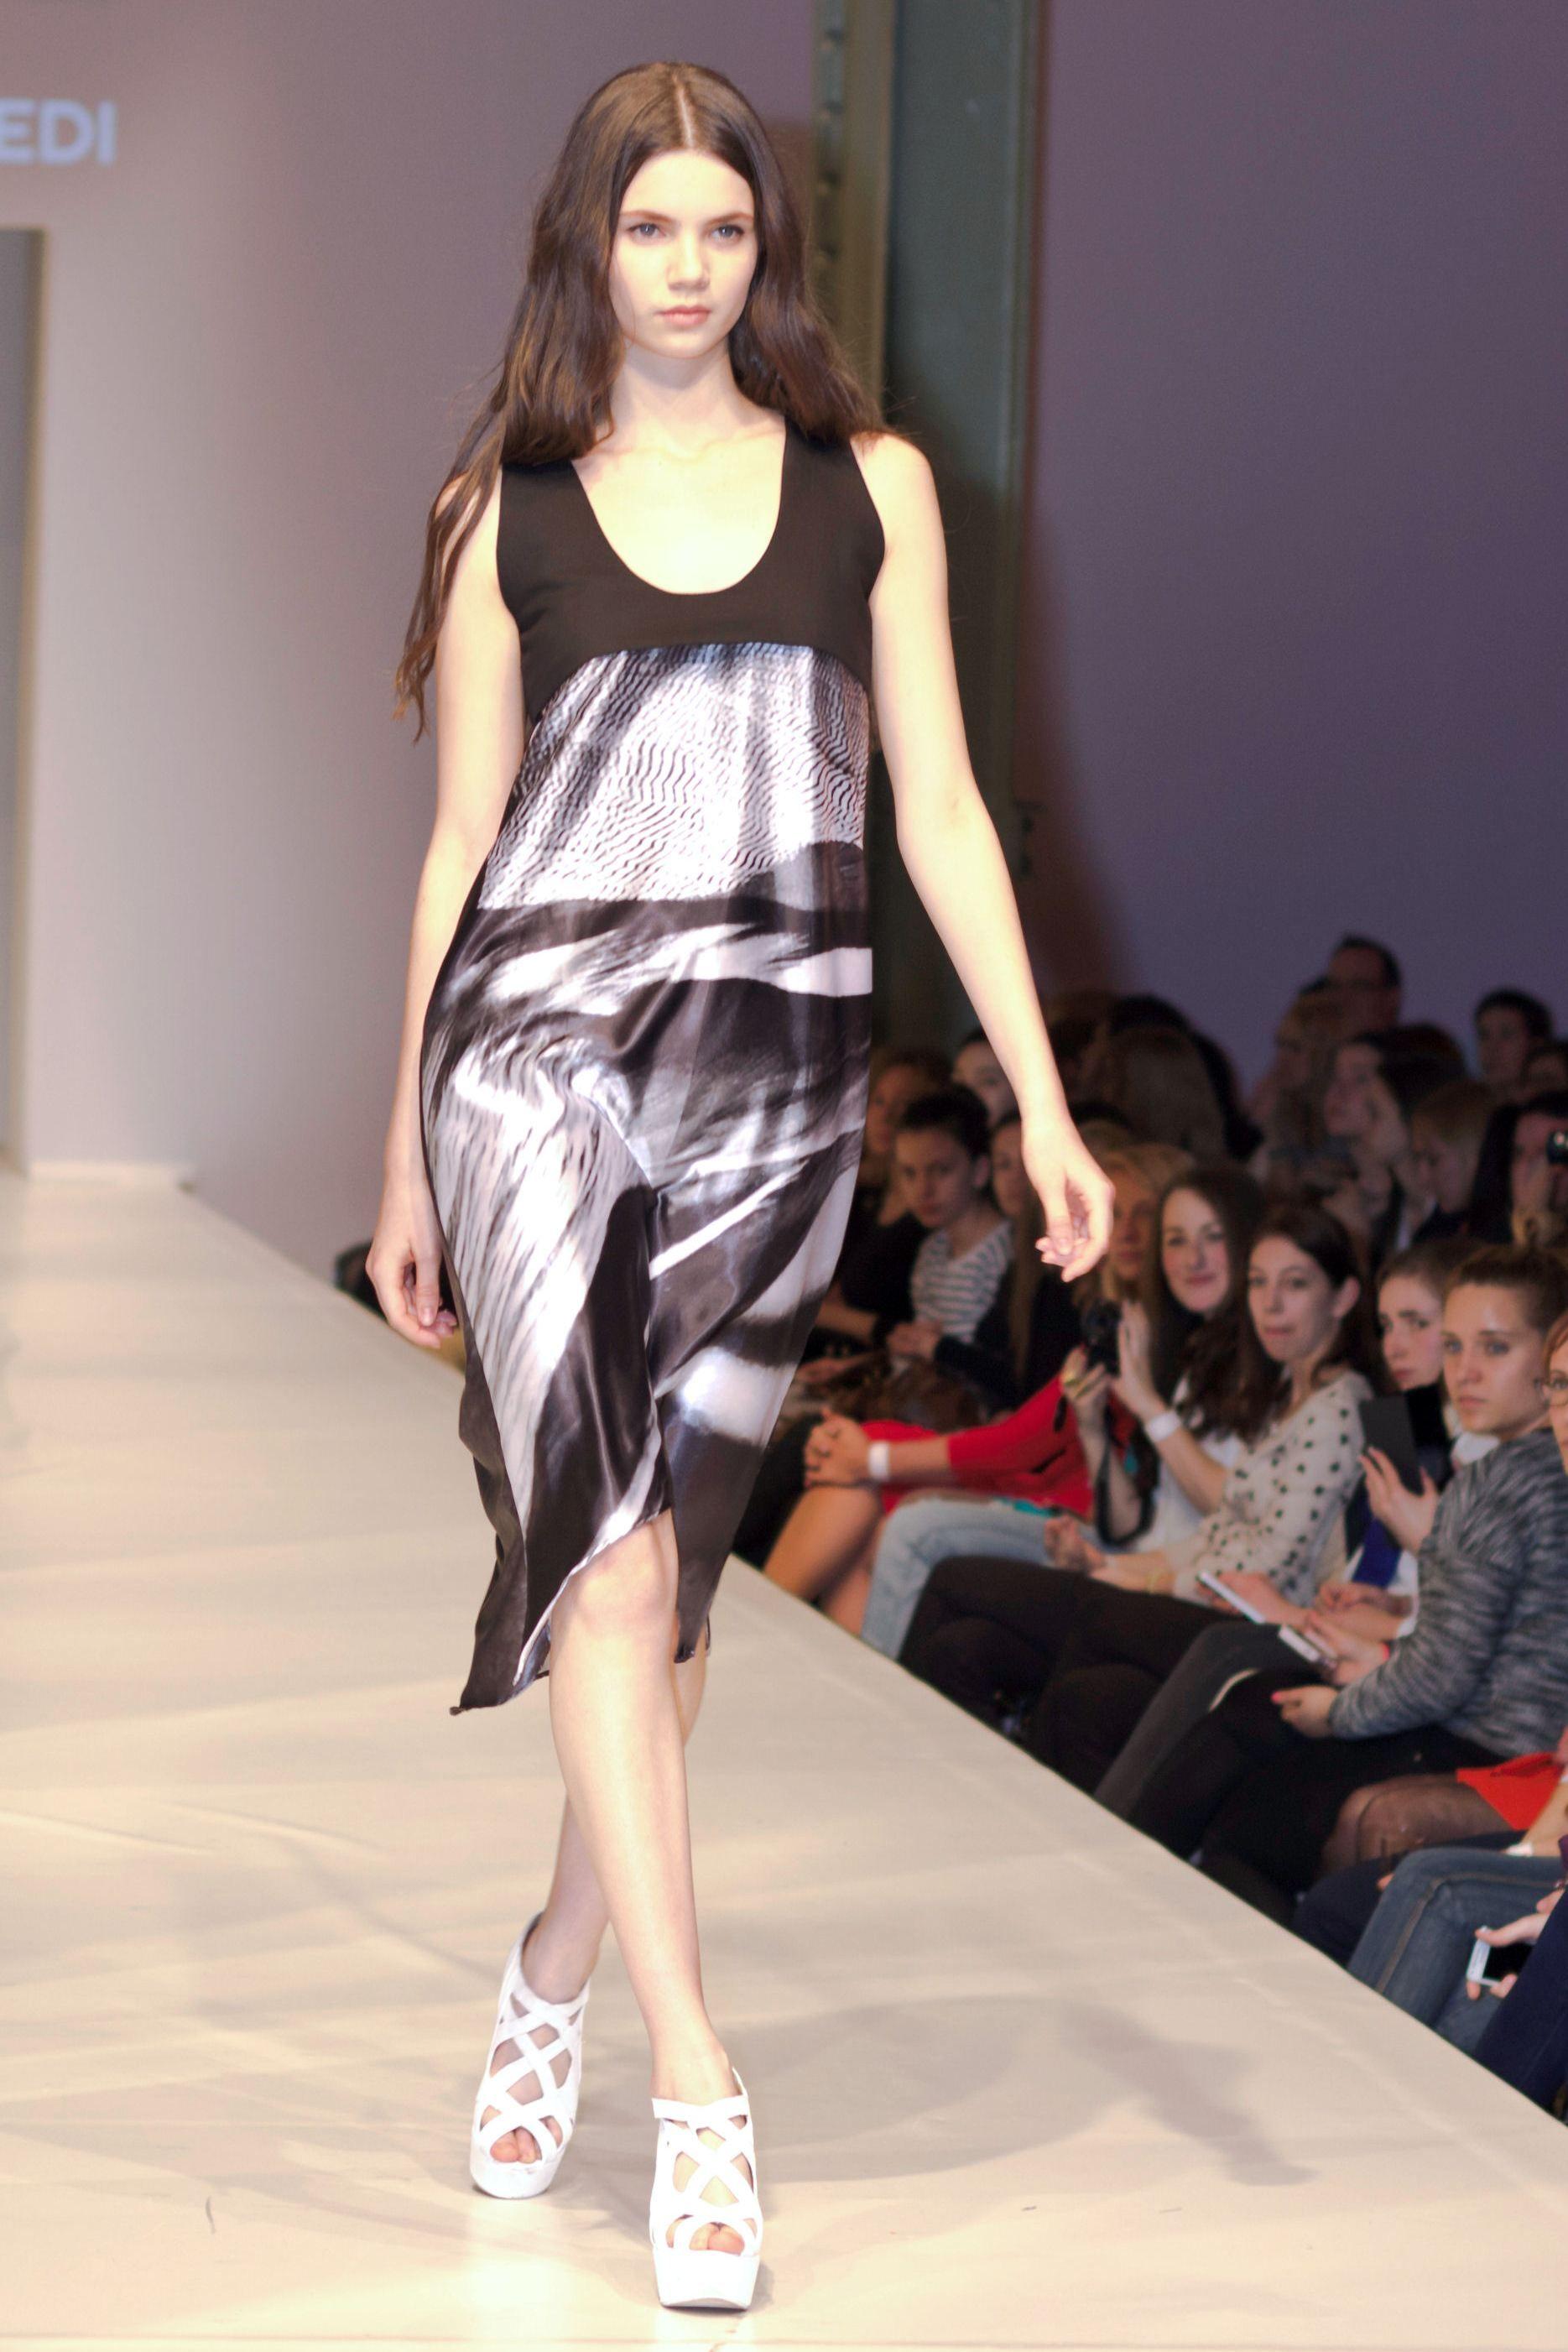 Kata Szegedi - Elle Fashion Show 2014 http://www.budapestwithus.hu/elle-fashion-show-2014/